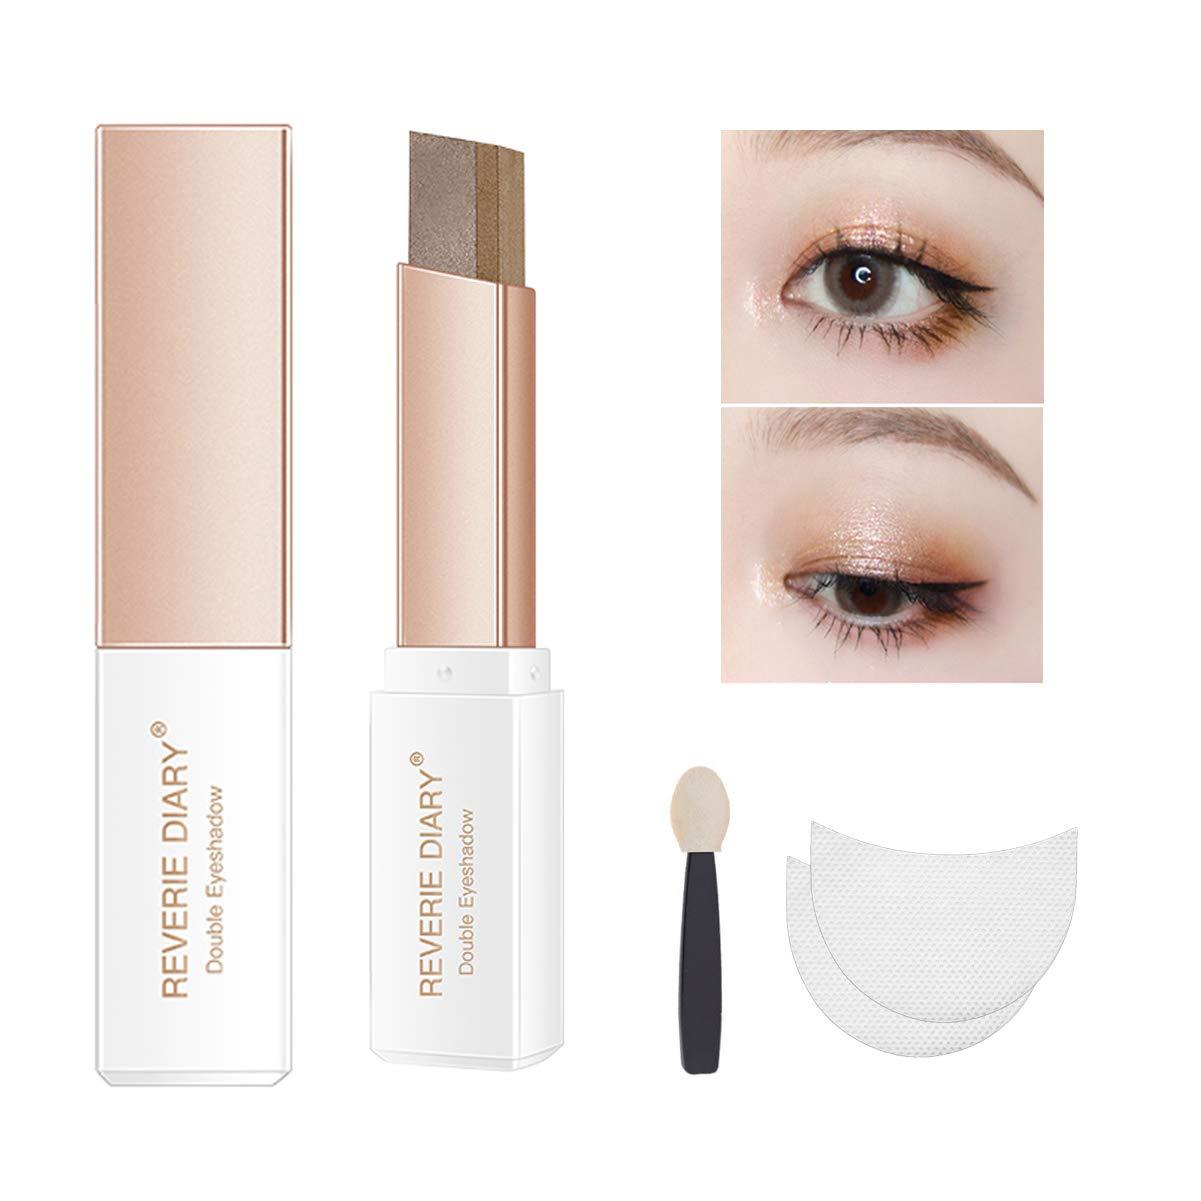 Three-piece eyeshadow stick eyeshadow prush eyeshadow sticker, eyeshadow stick two-color gradient glitter eye shadow pen rotating design, simple makeup, waterproof and not Blooming(EarthTone)